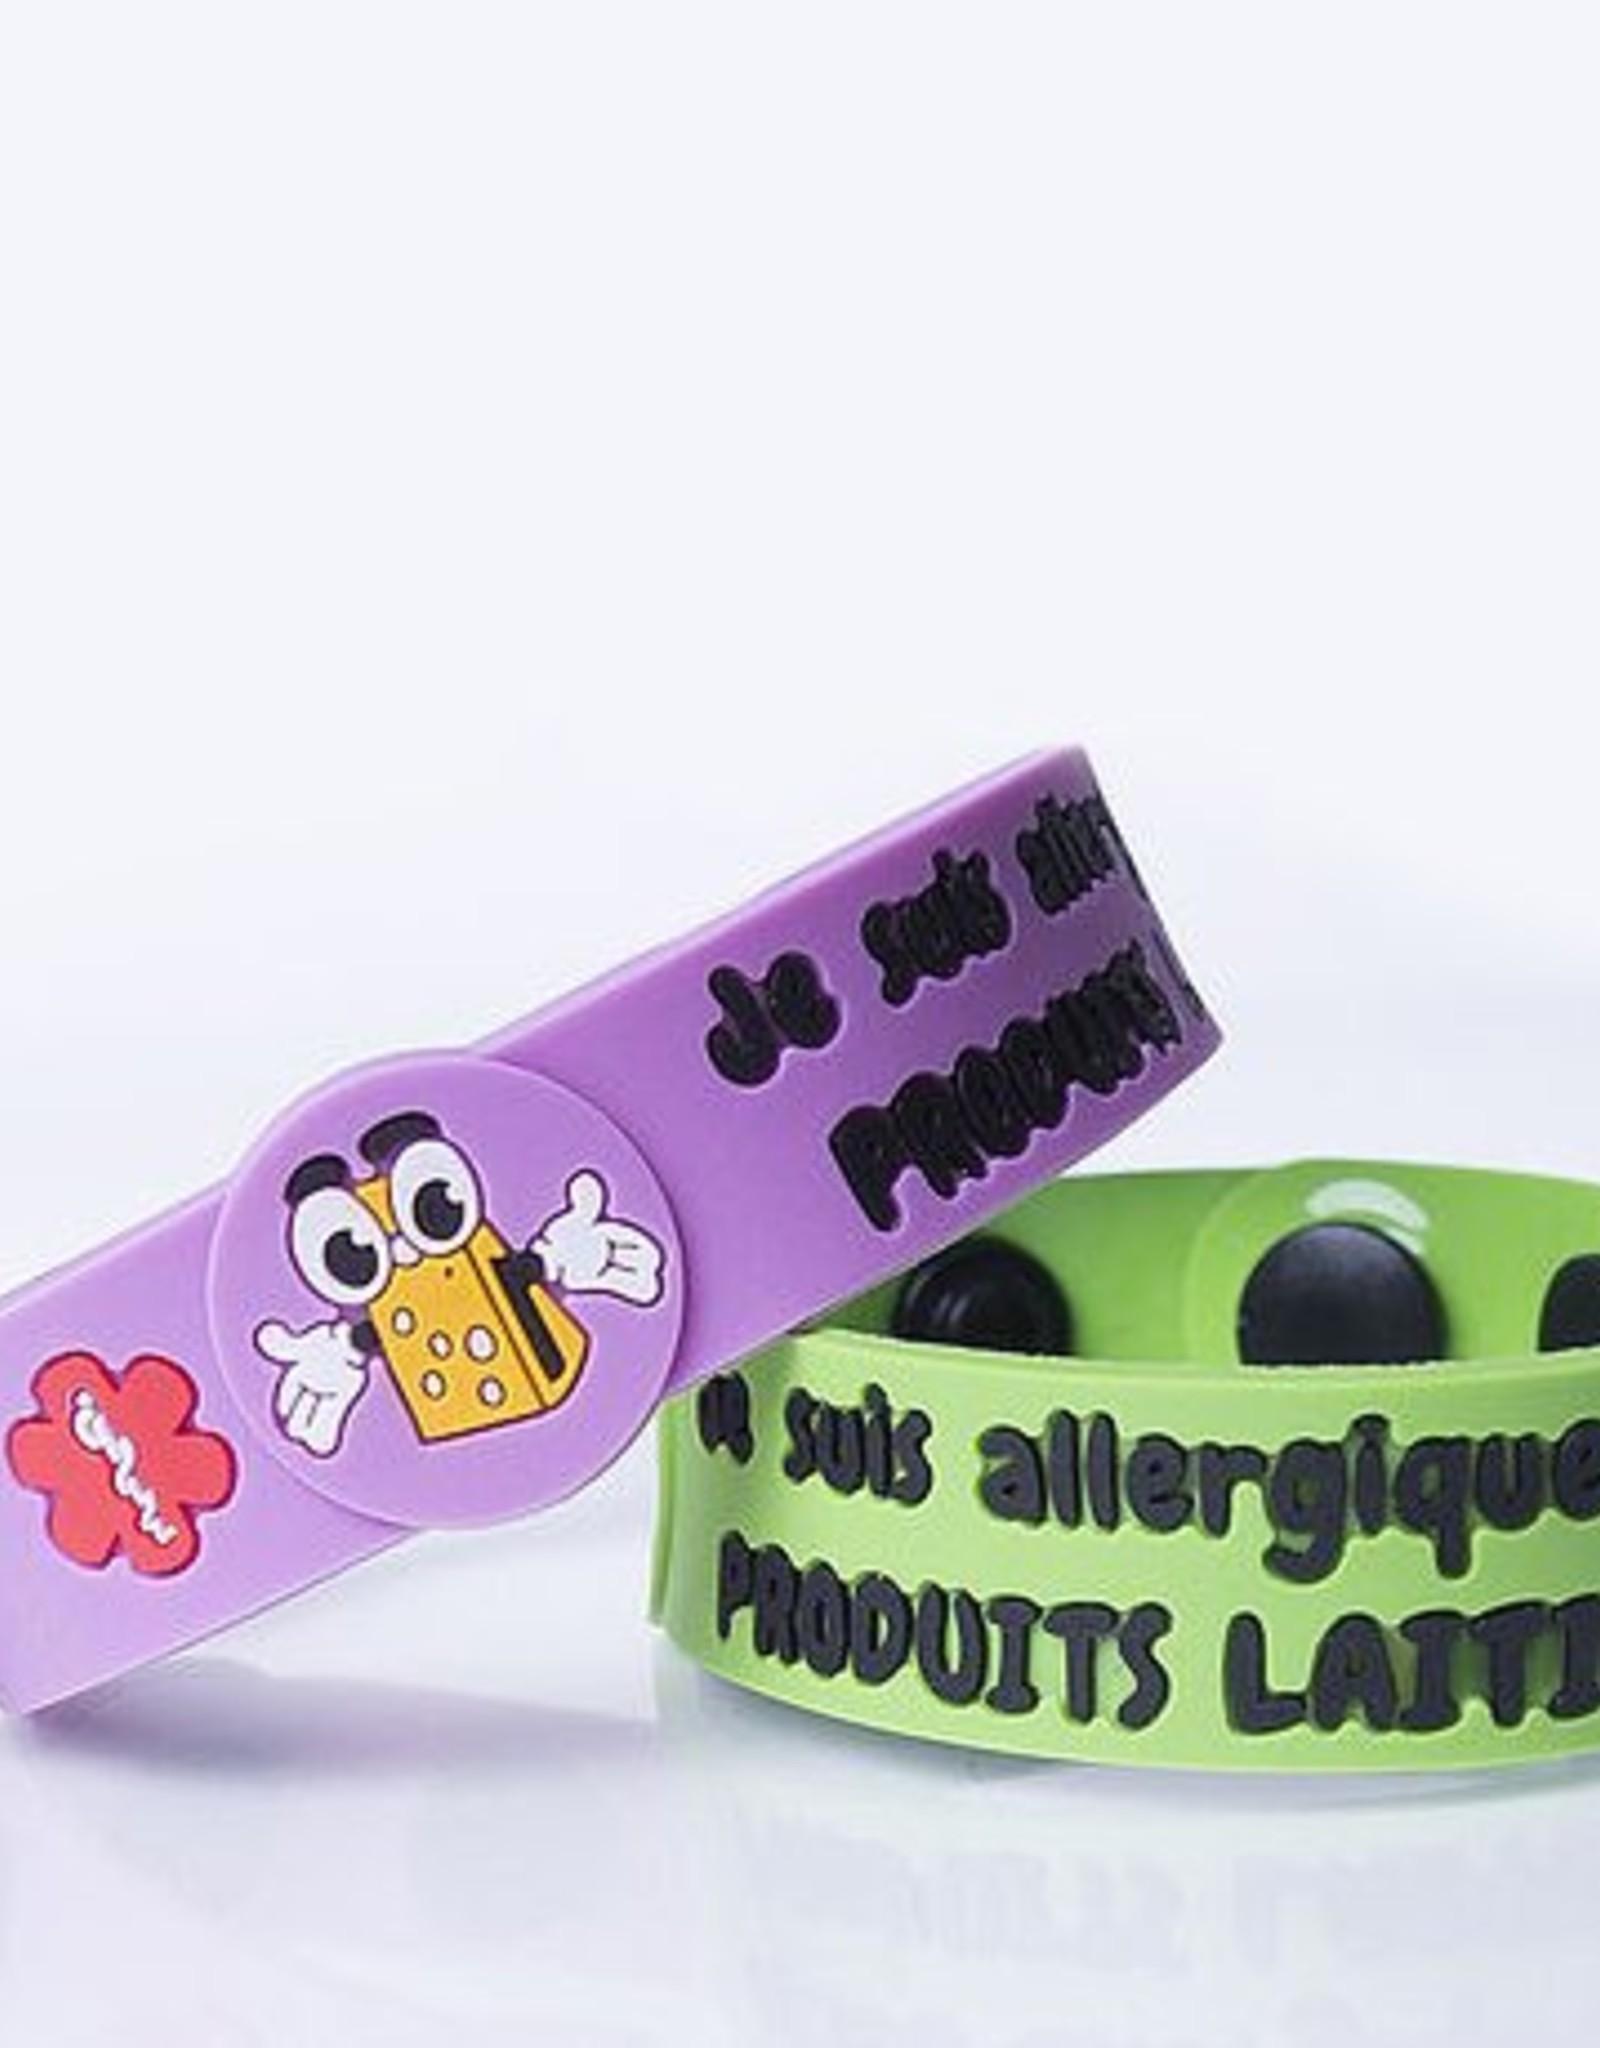 Secallergies Bracelet d'allergie :  Produits laitiers